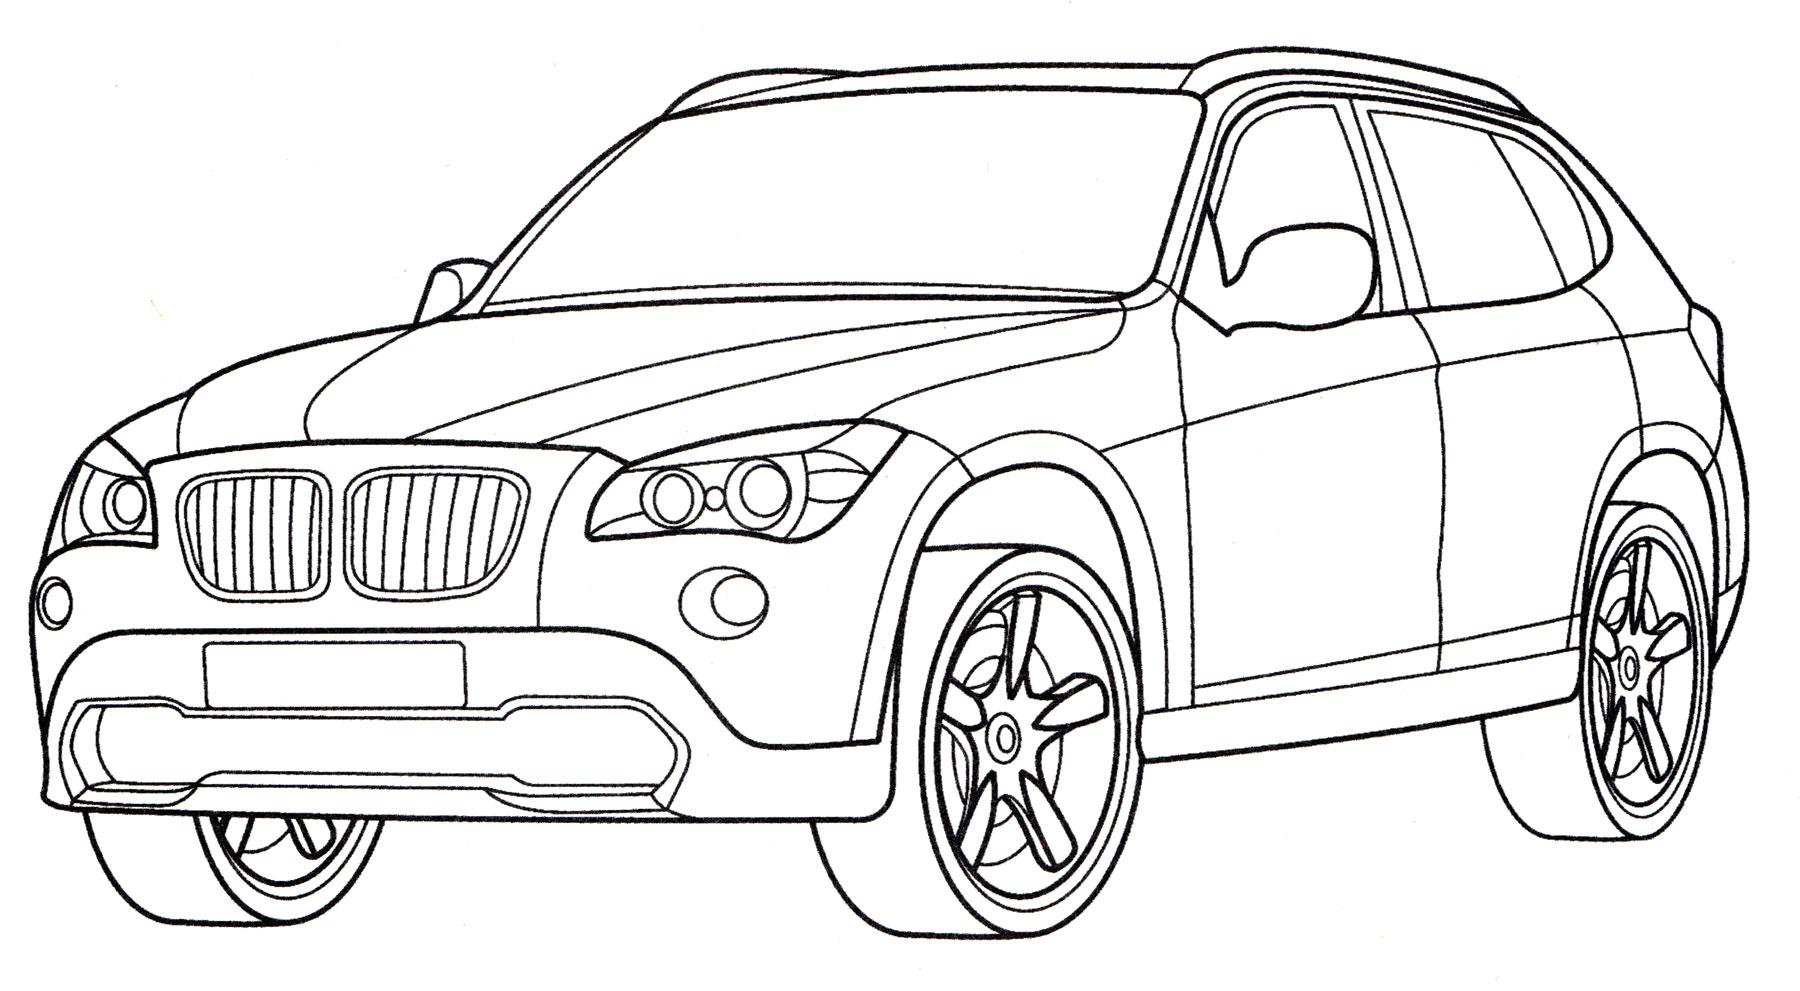 Раскраска БМВ X1